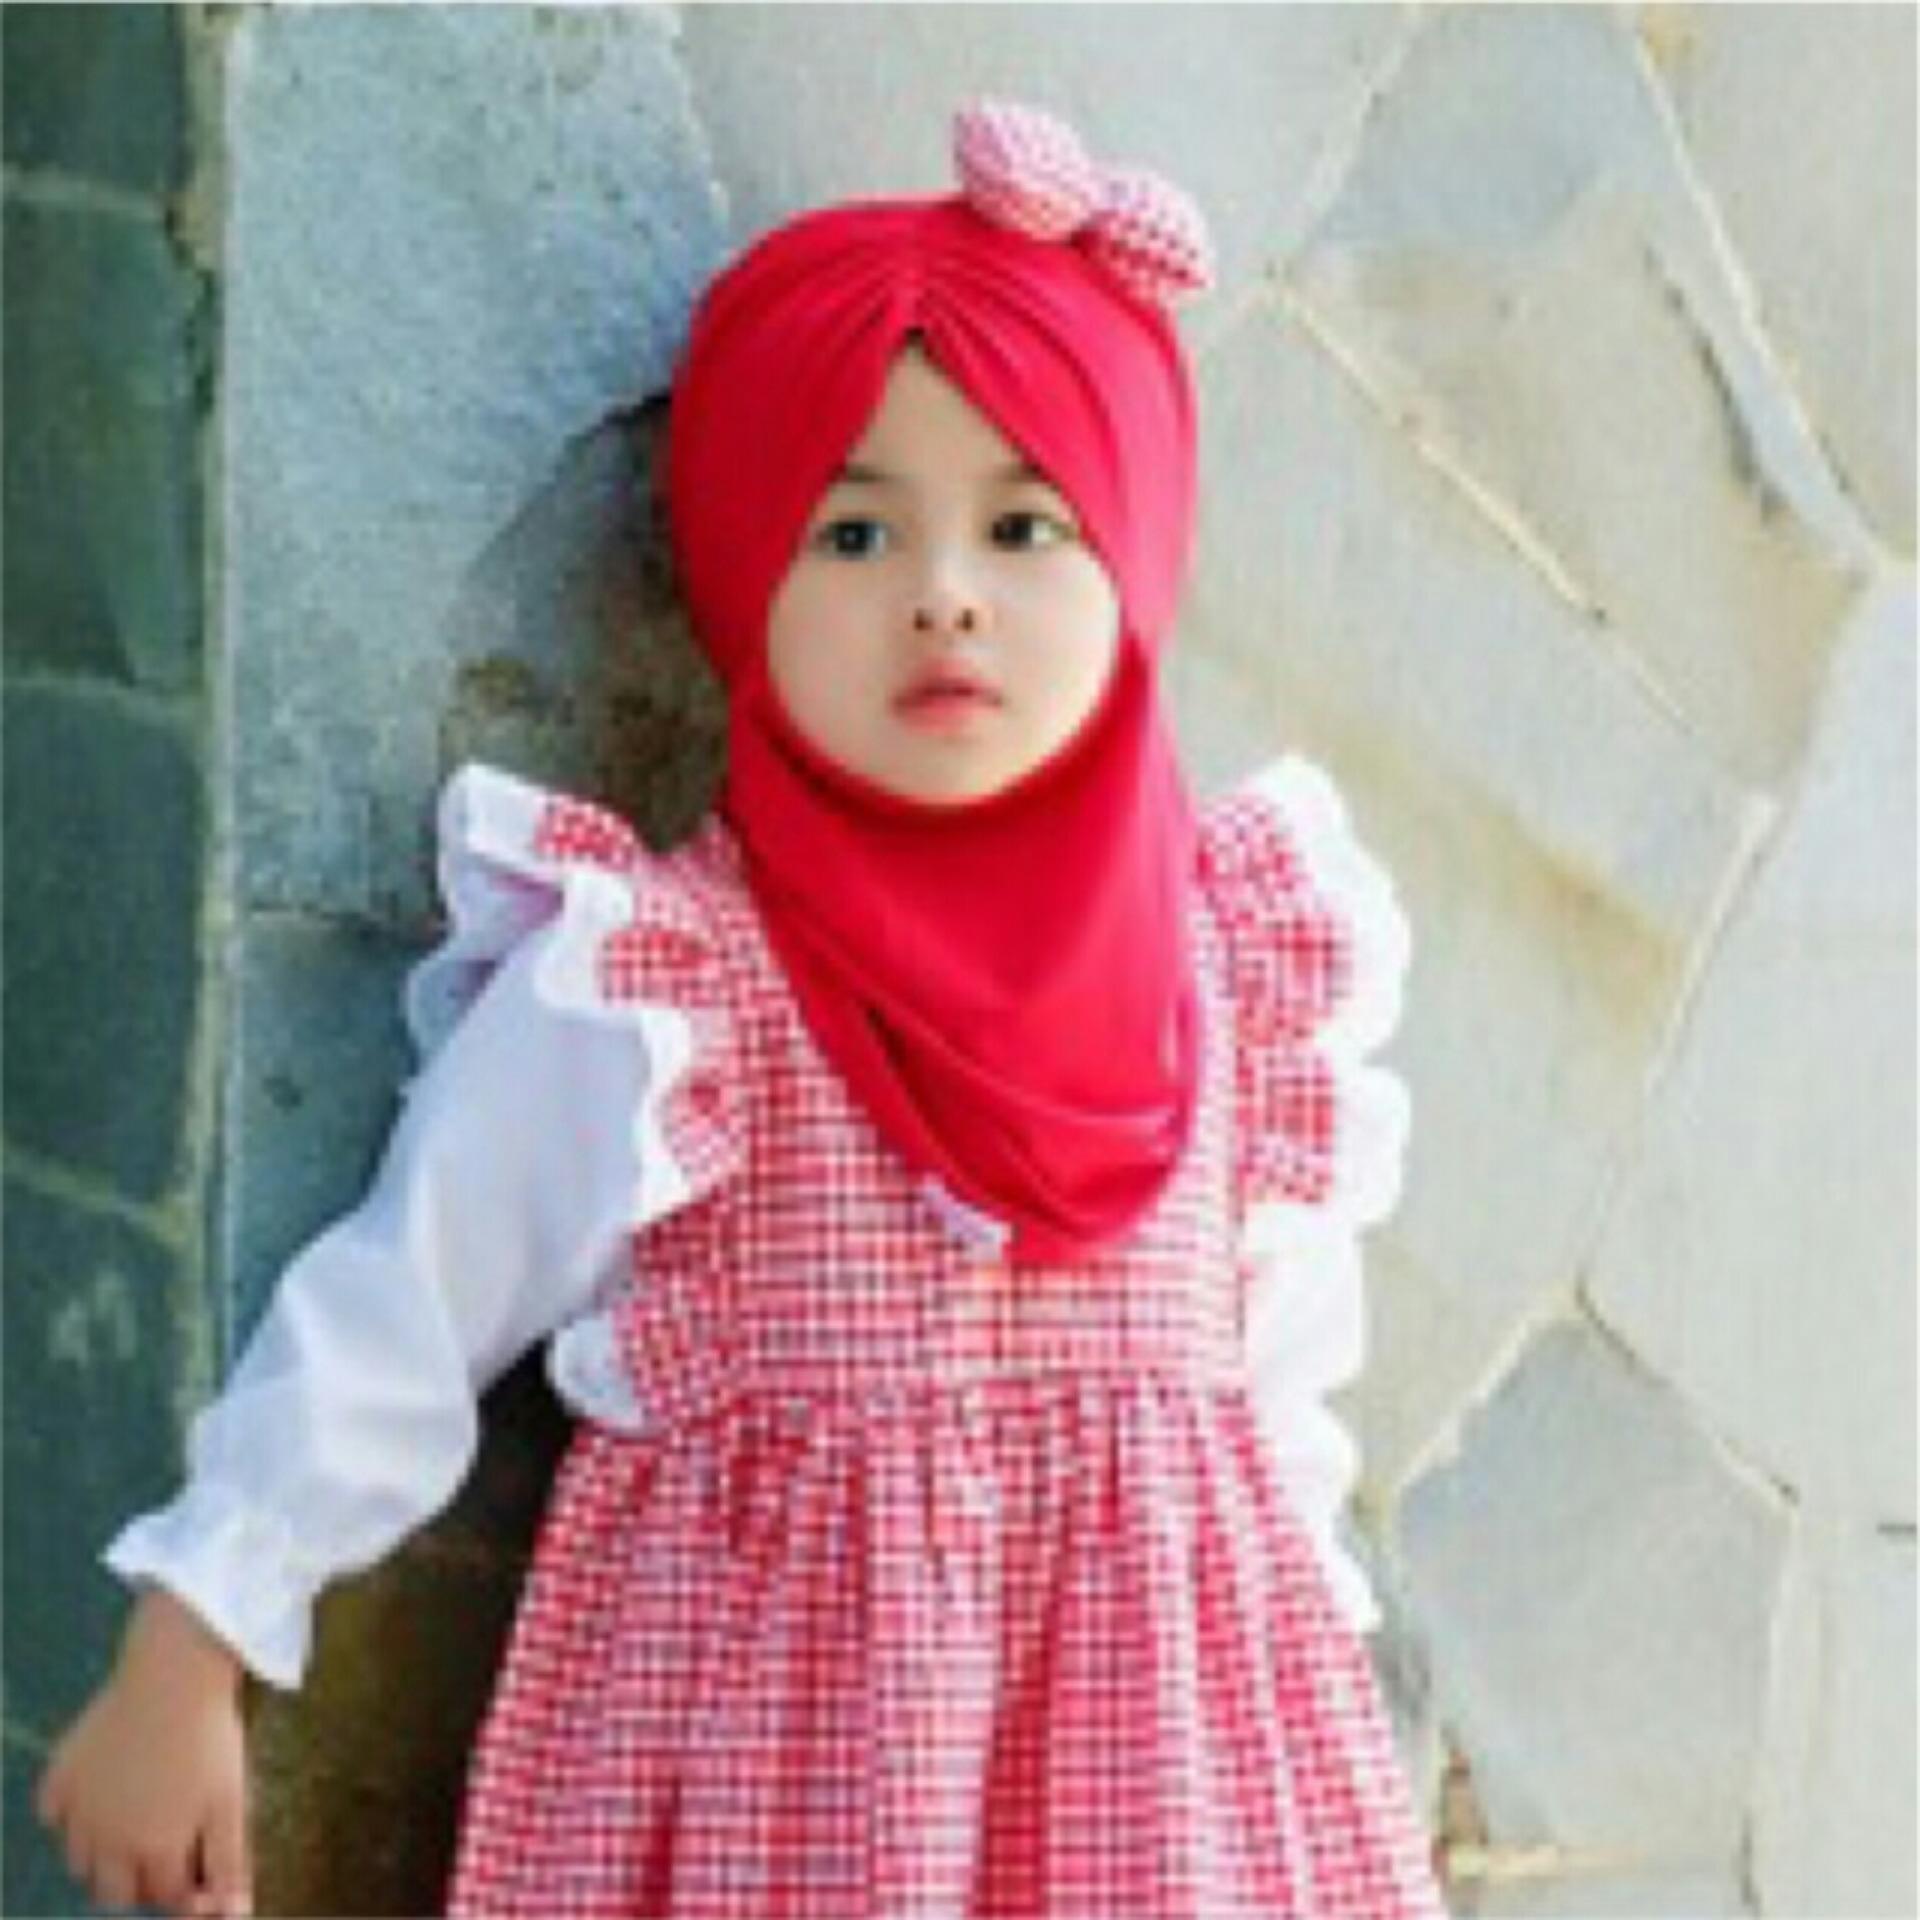 ... Hijab Pashmina Instan Anak. Source · Kerudung Anak Bayi /anak mini mouse samping polka / Jilbab Anak Bayi / Jilbab Bayi